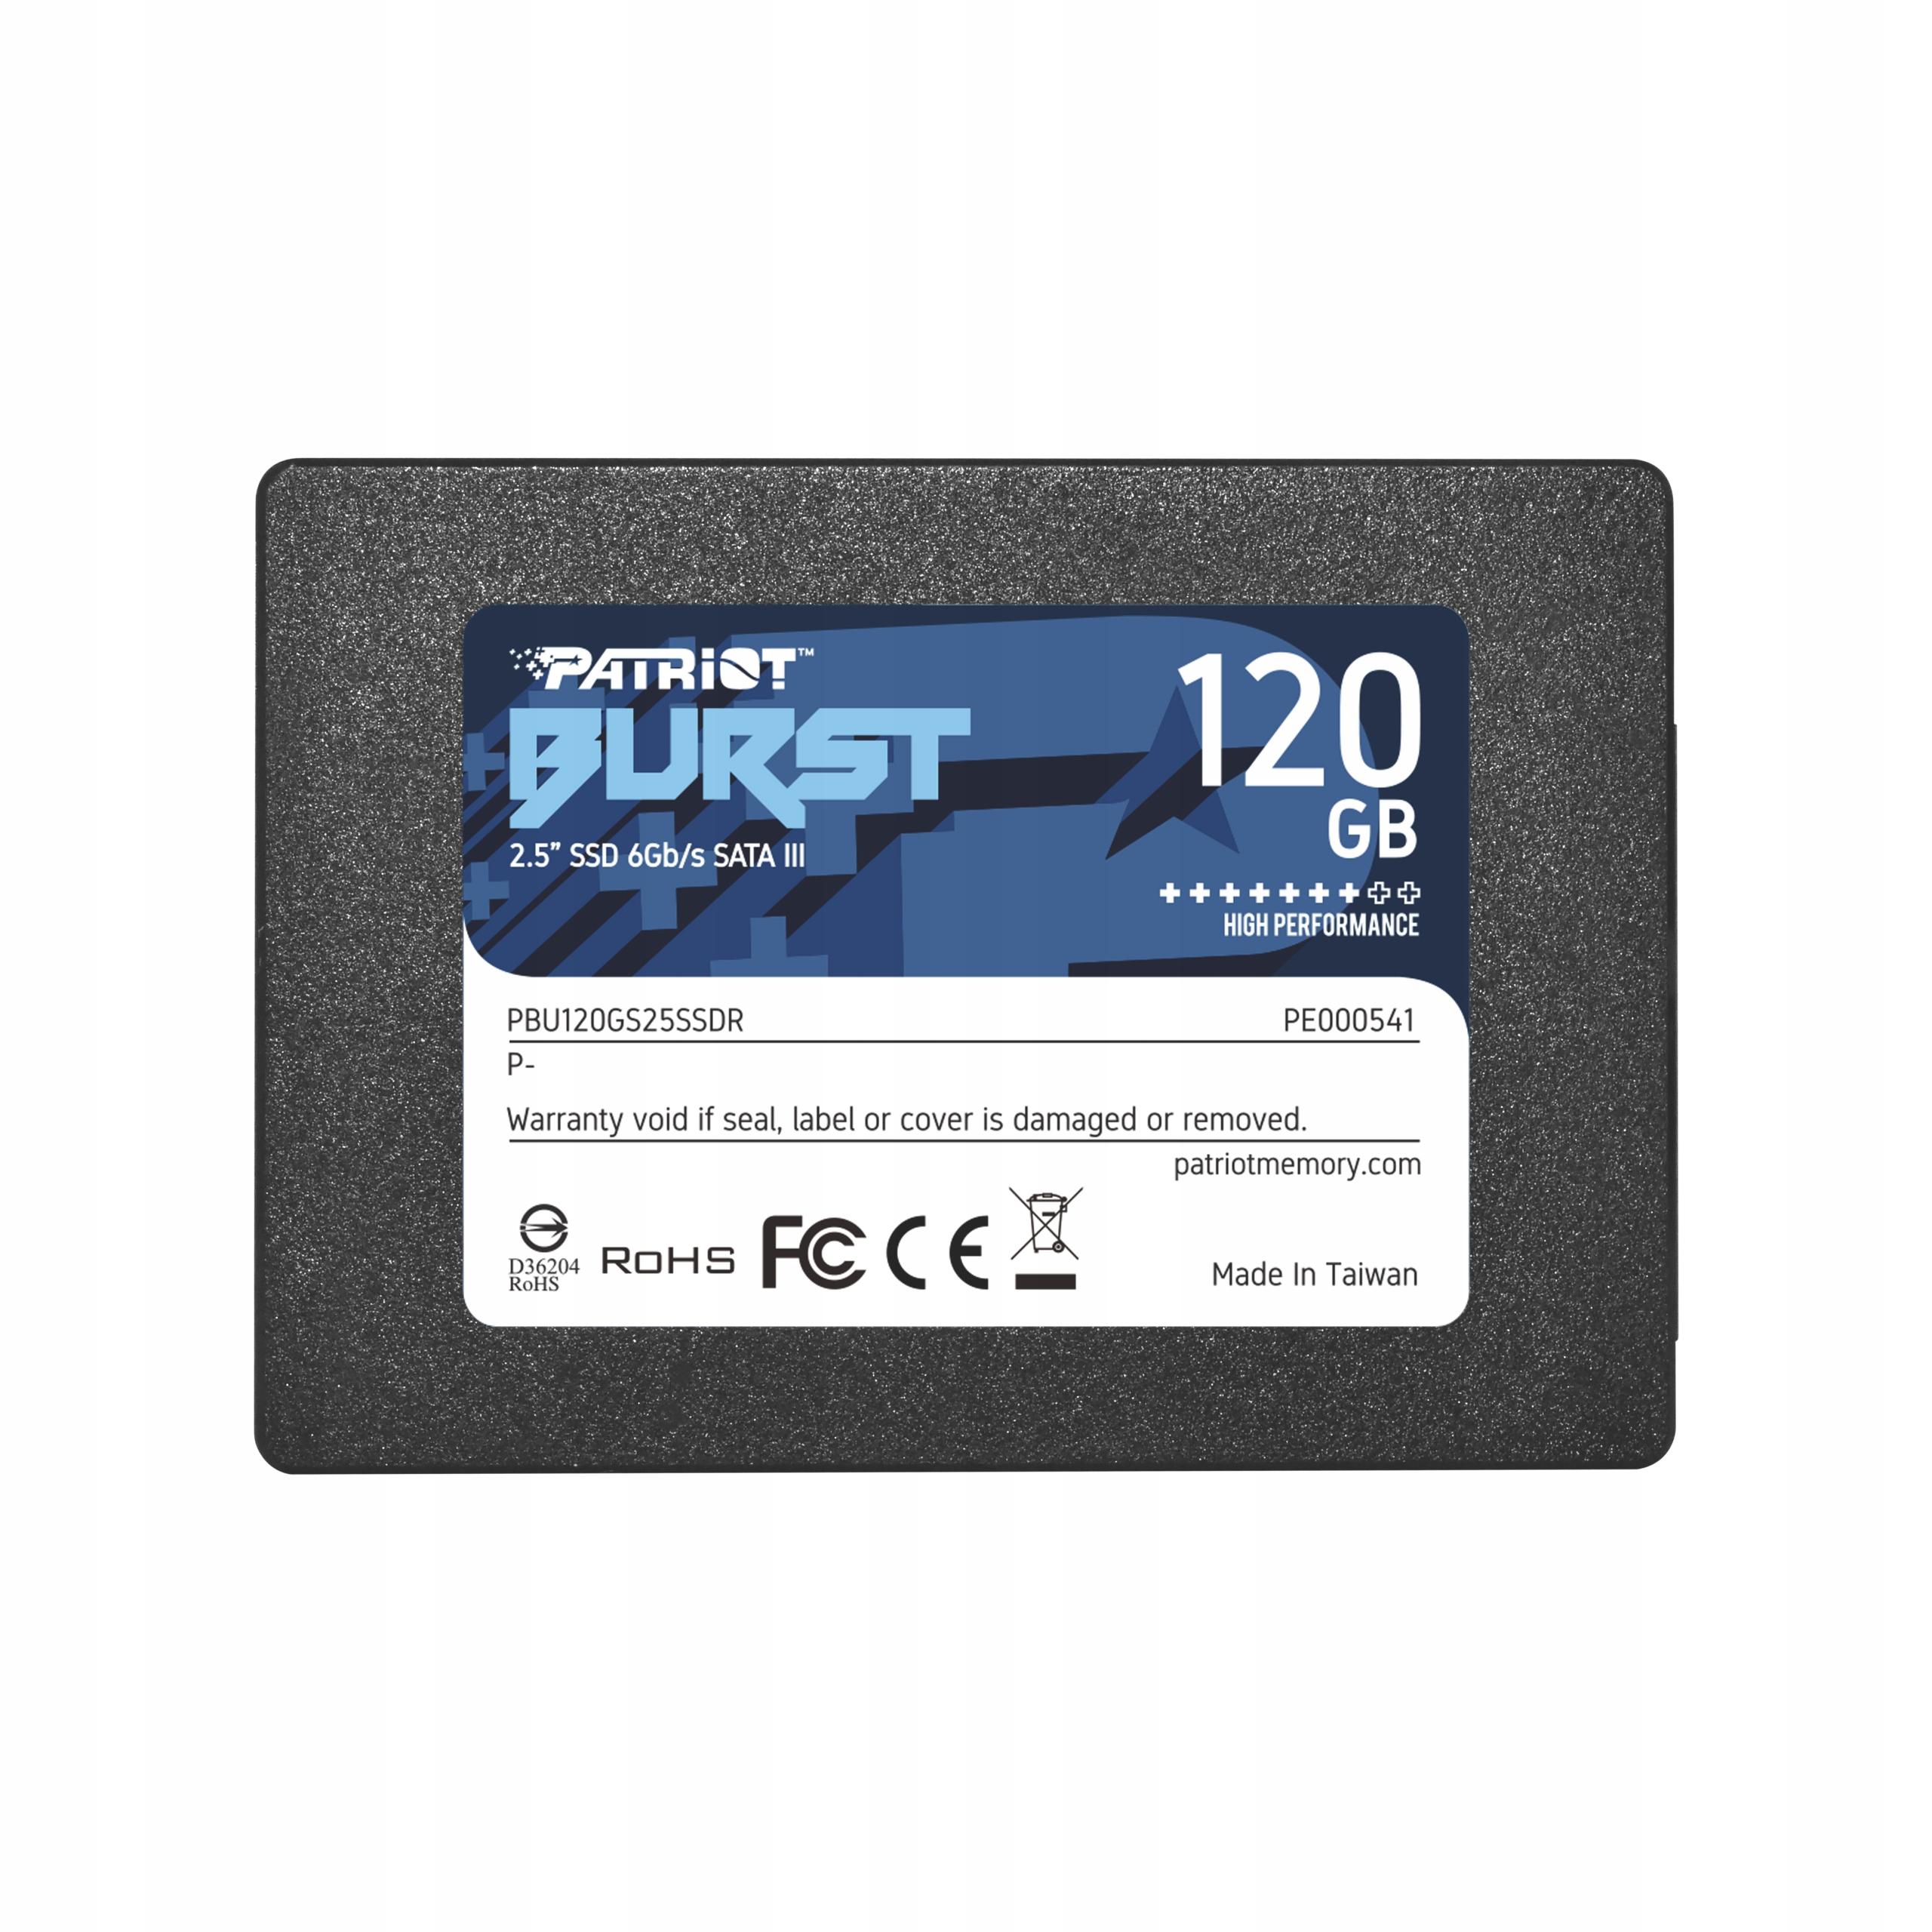 SSD PATRIOT 120GB Burst, Allegro Smart! week /gratis wysyłka